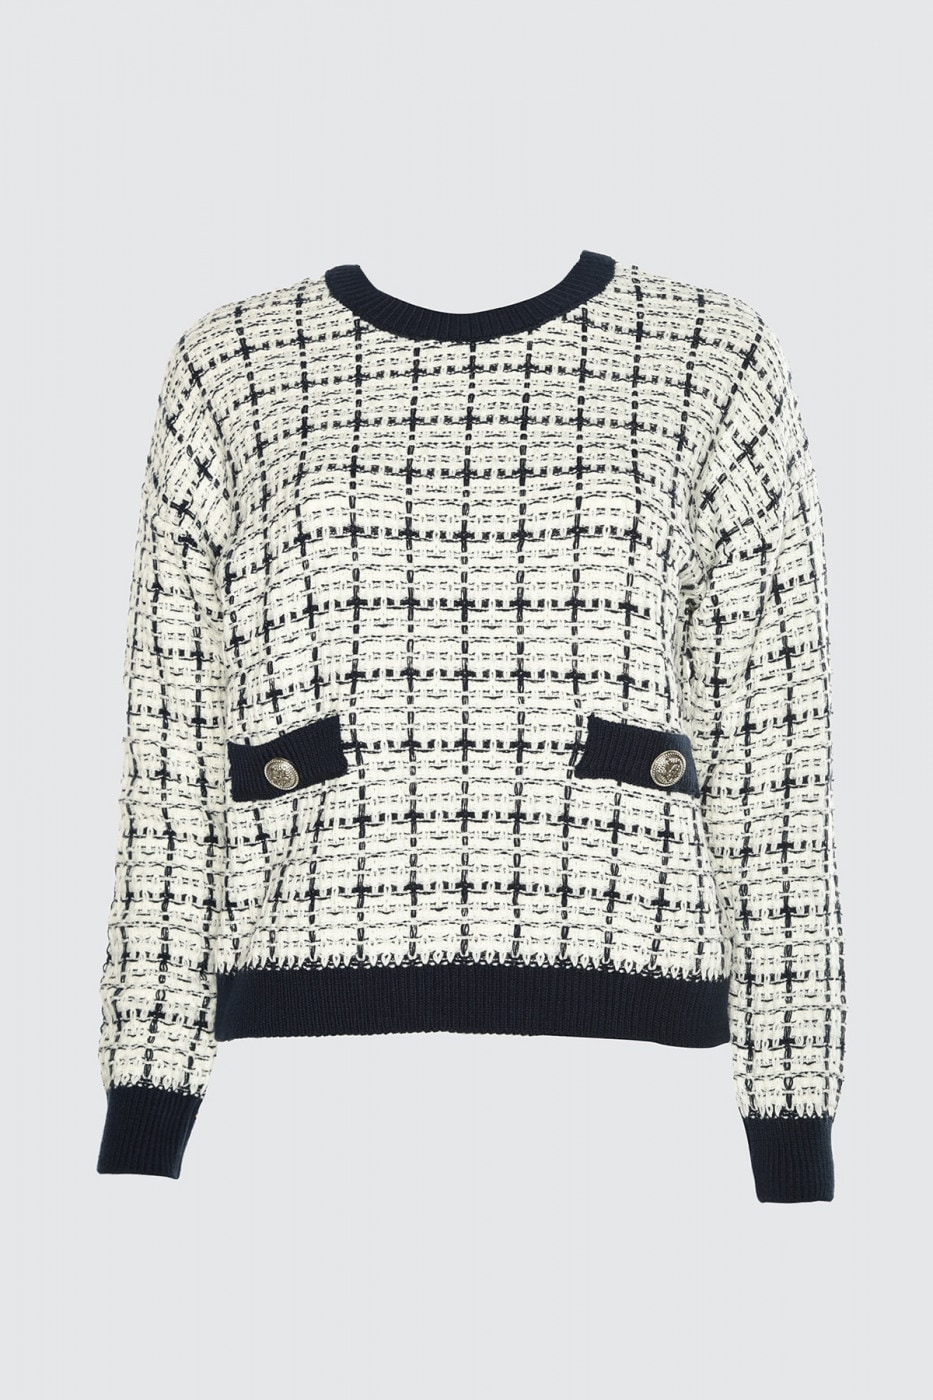 Trendyol Navy Simli Tweed-Looking Knit Sweater